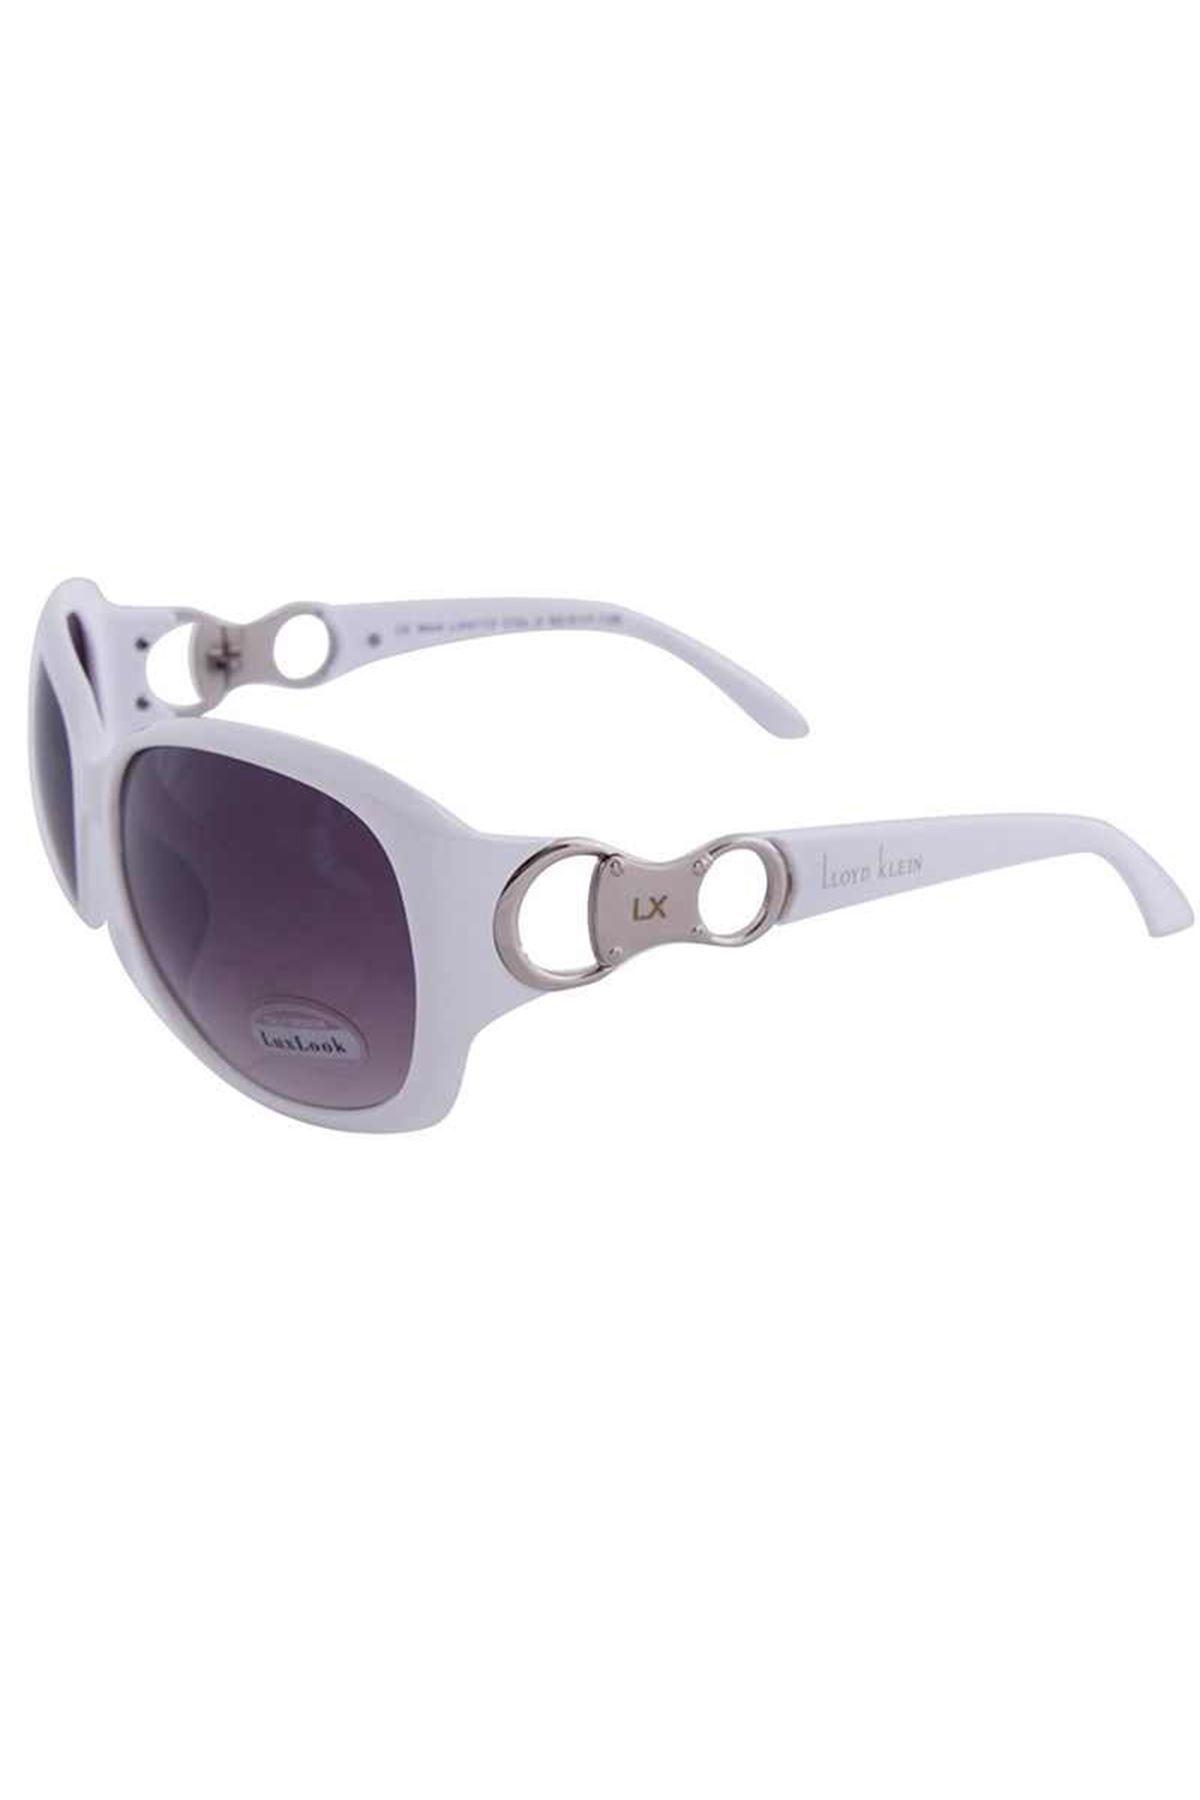 Lloyd Klein Güneş Gözlüğü 30A-72630